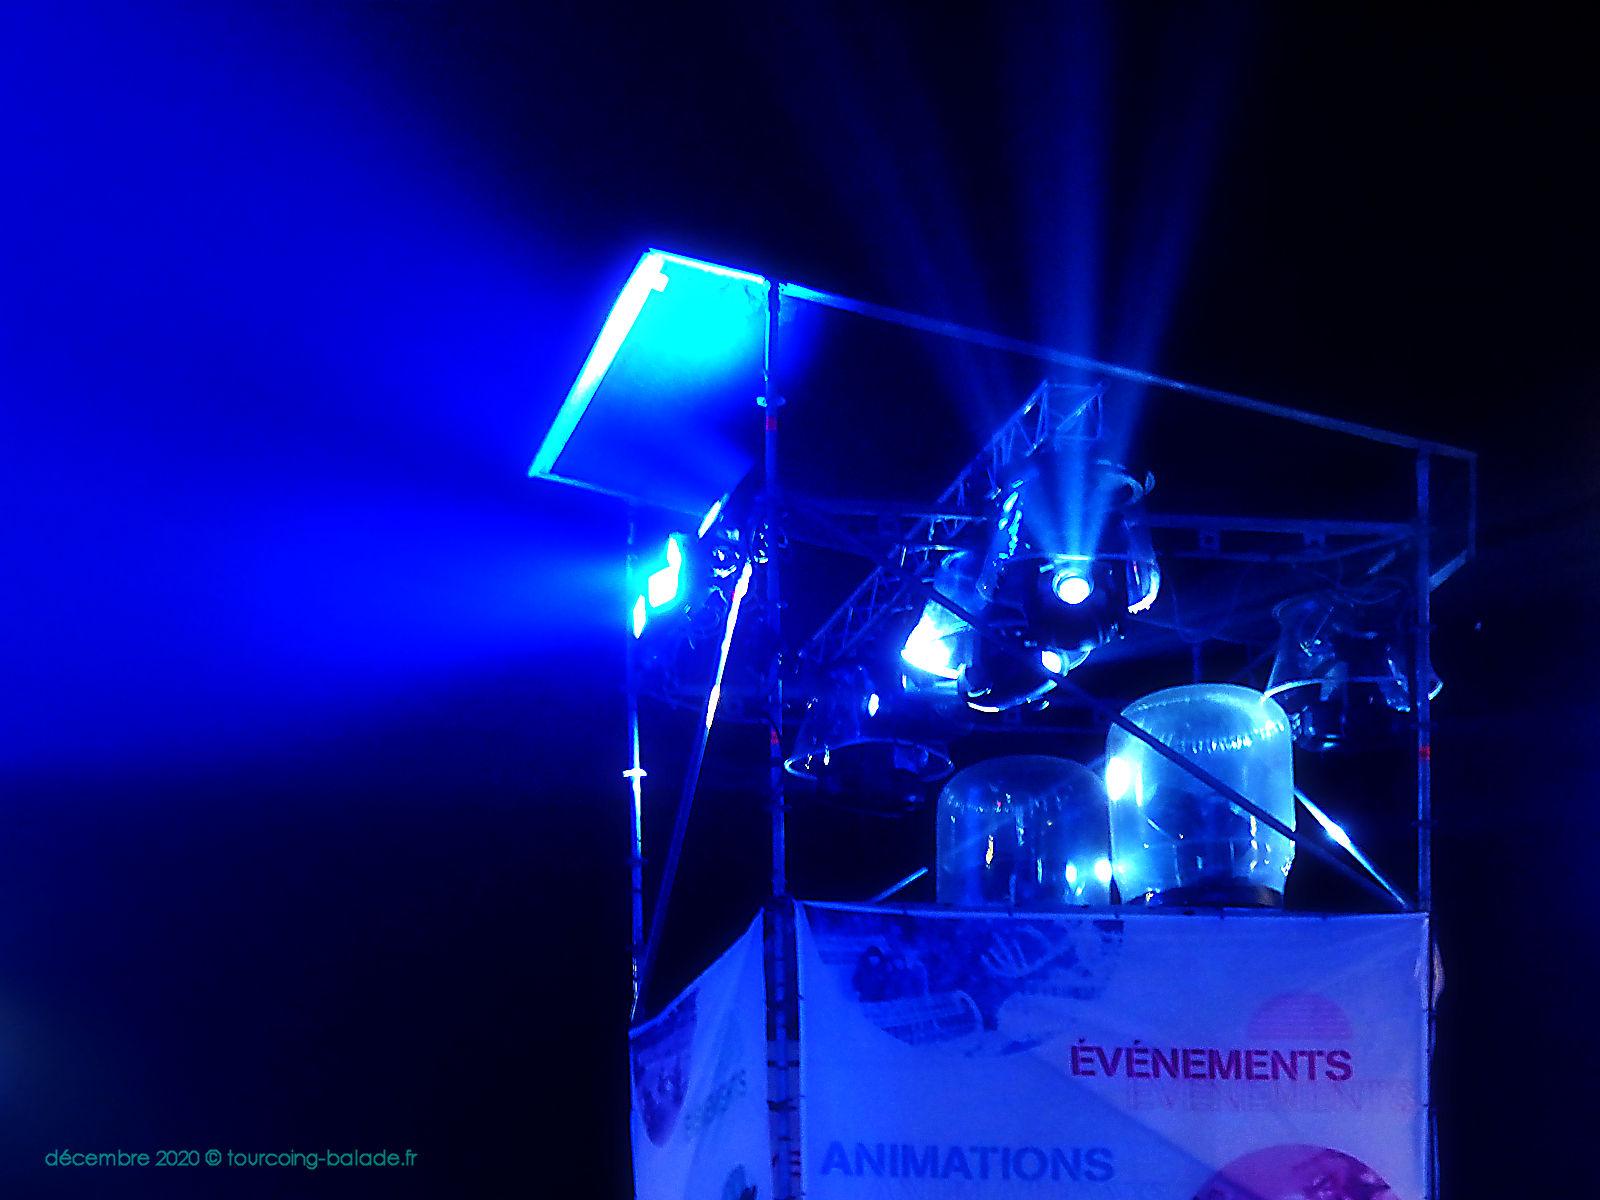 Projecteur d'illuminations, Tourcoing 2020